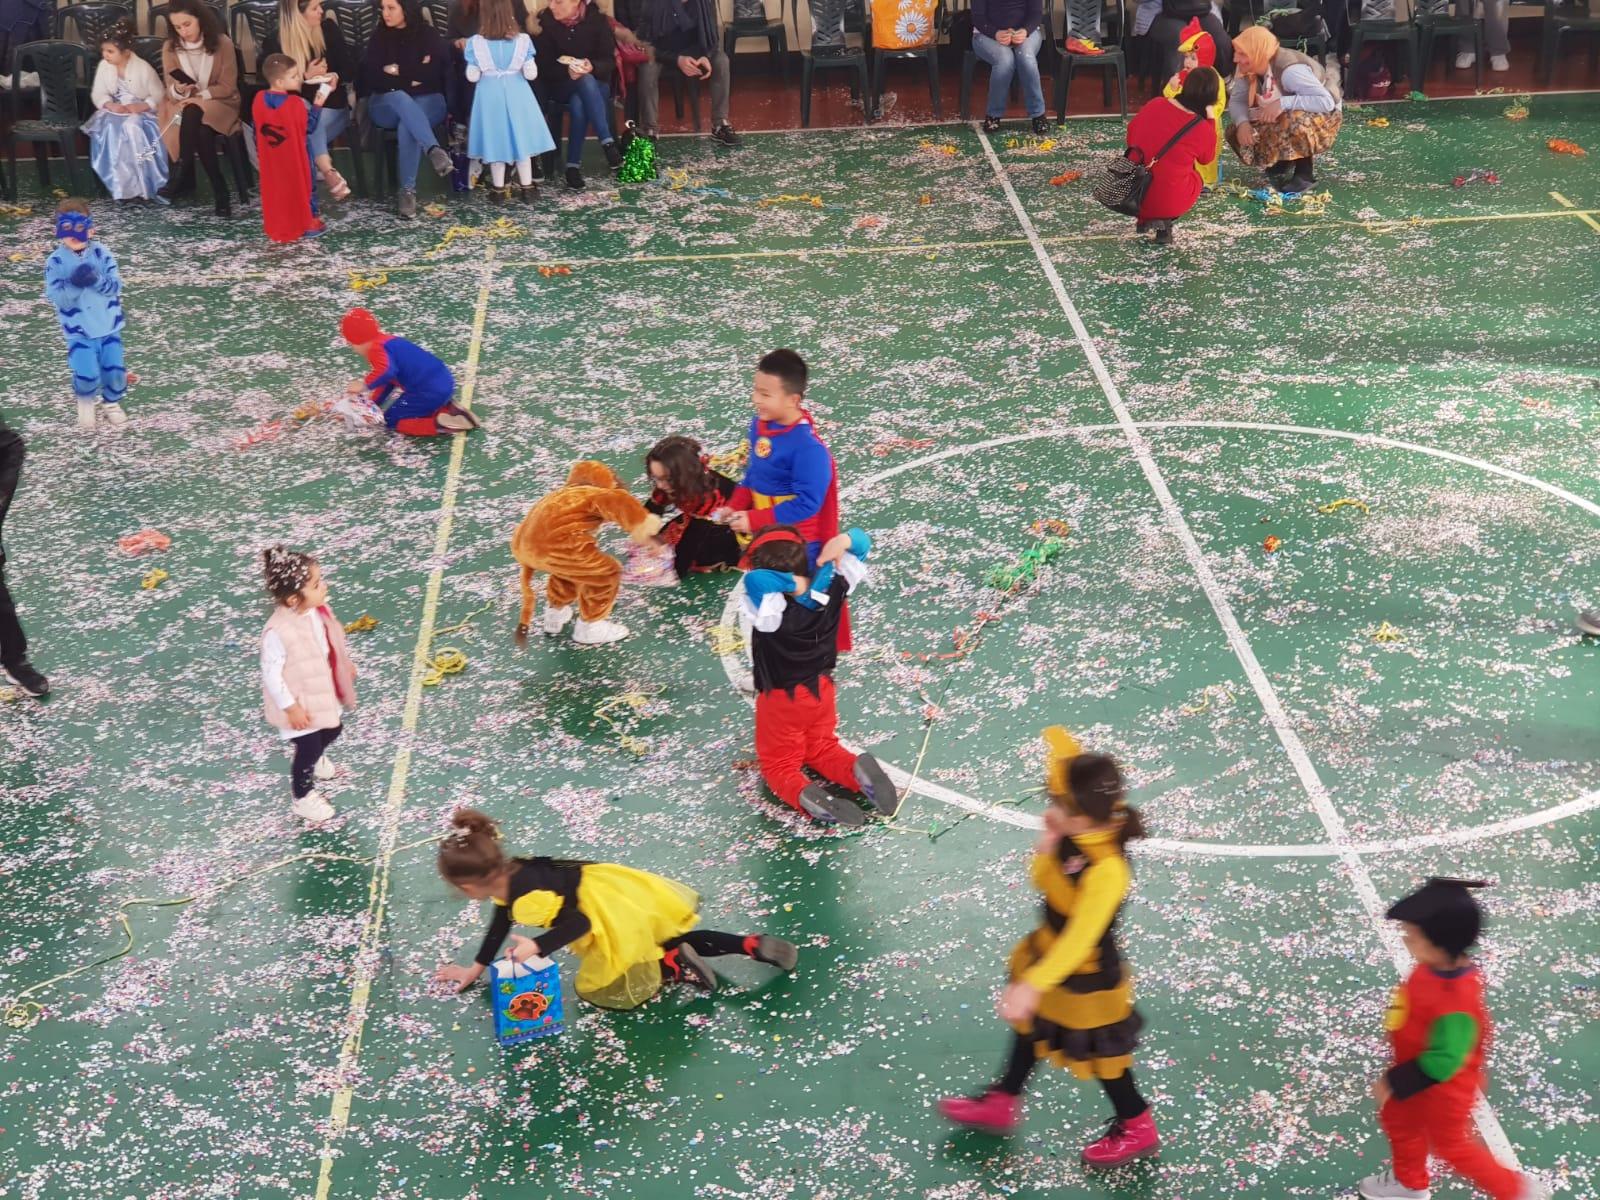 Baraonda Carnevale 2019 (40)